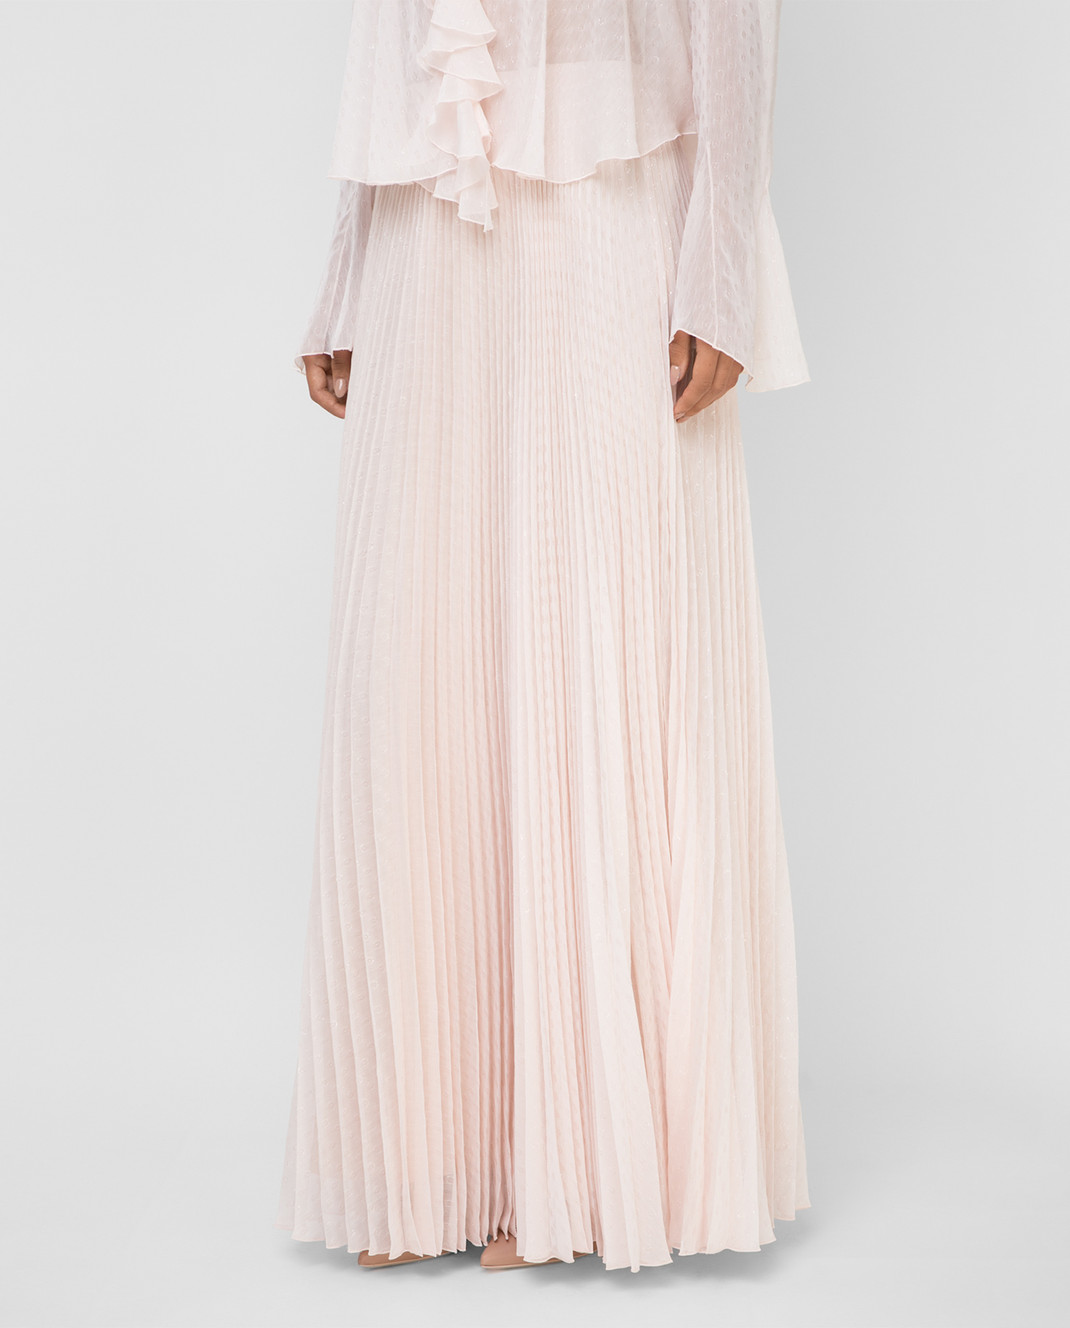 Philosophy di Lorenzo Serafini Светло-розовая юбка изображение 3